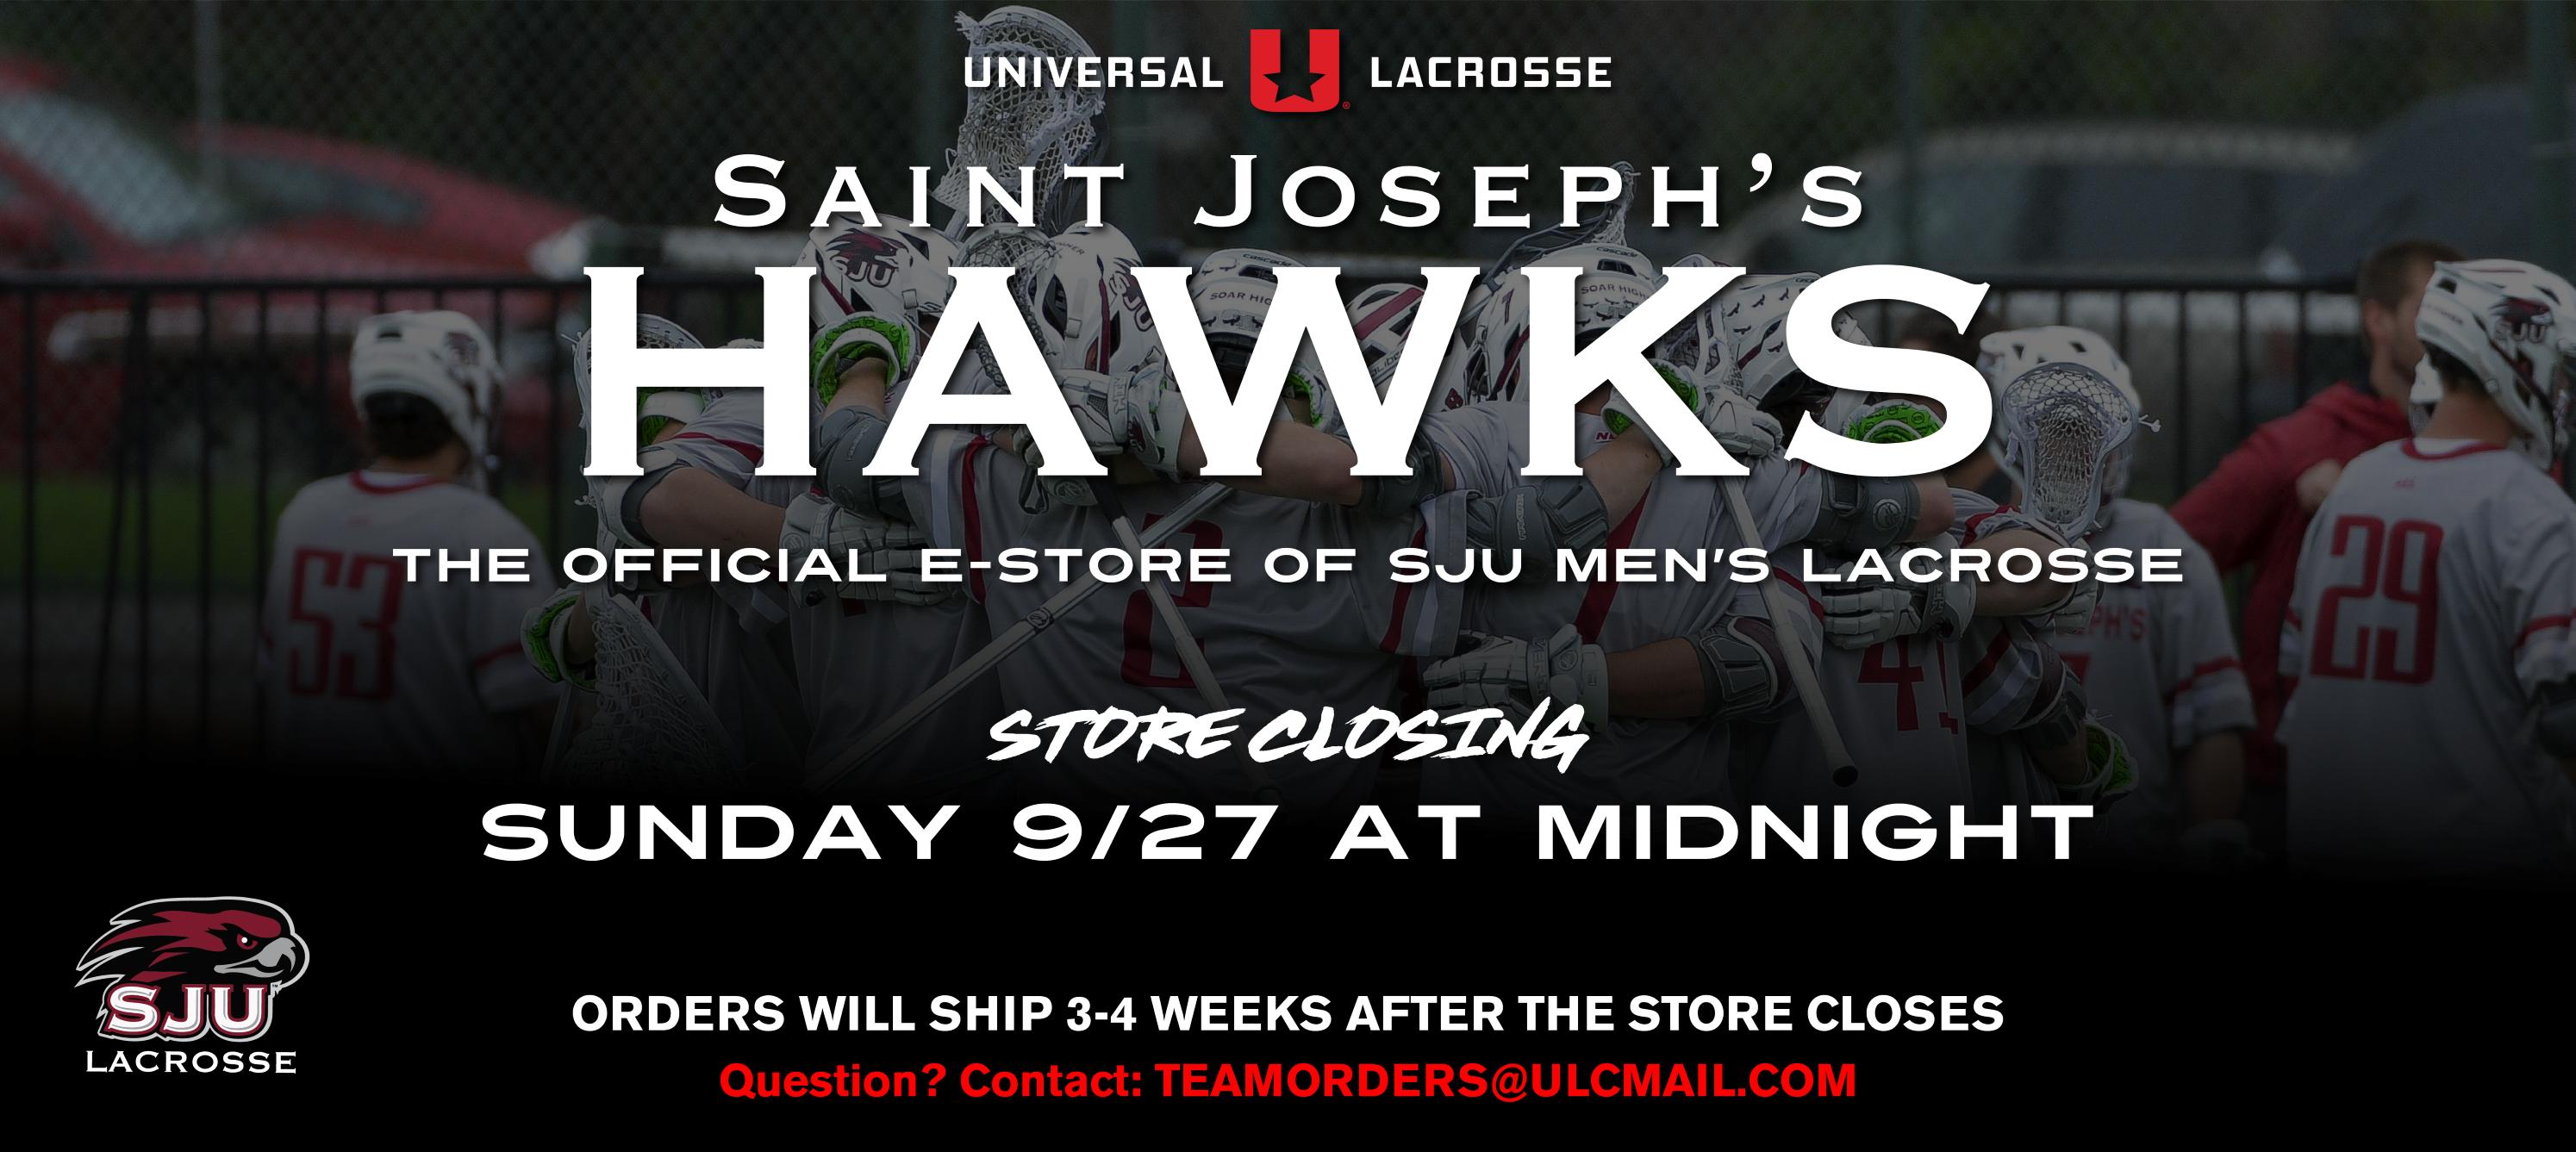 Saint Joseph's University Men's Lacrosse